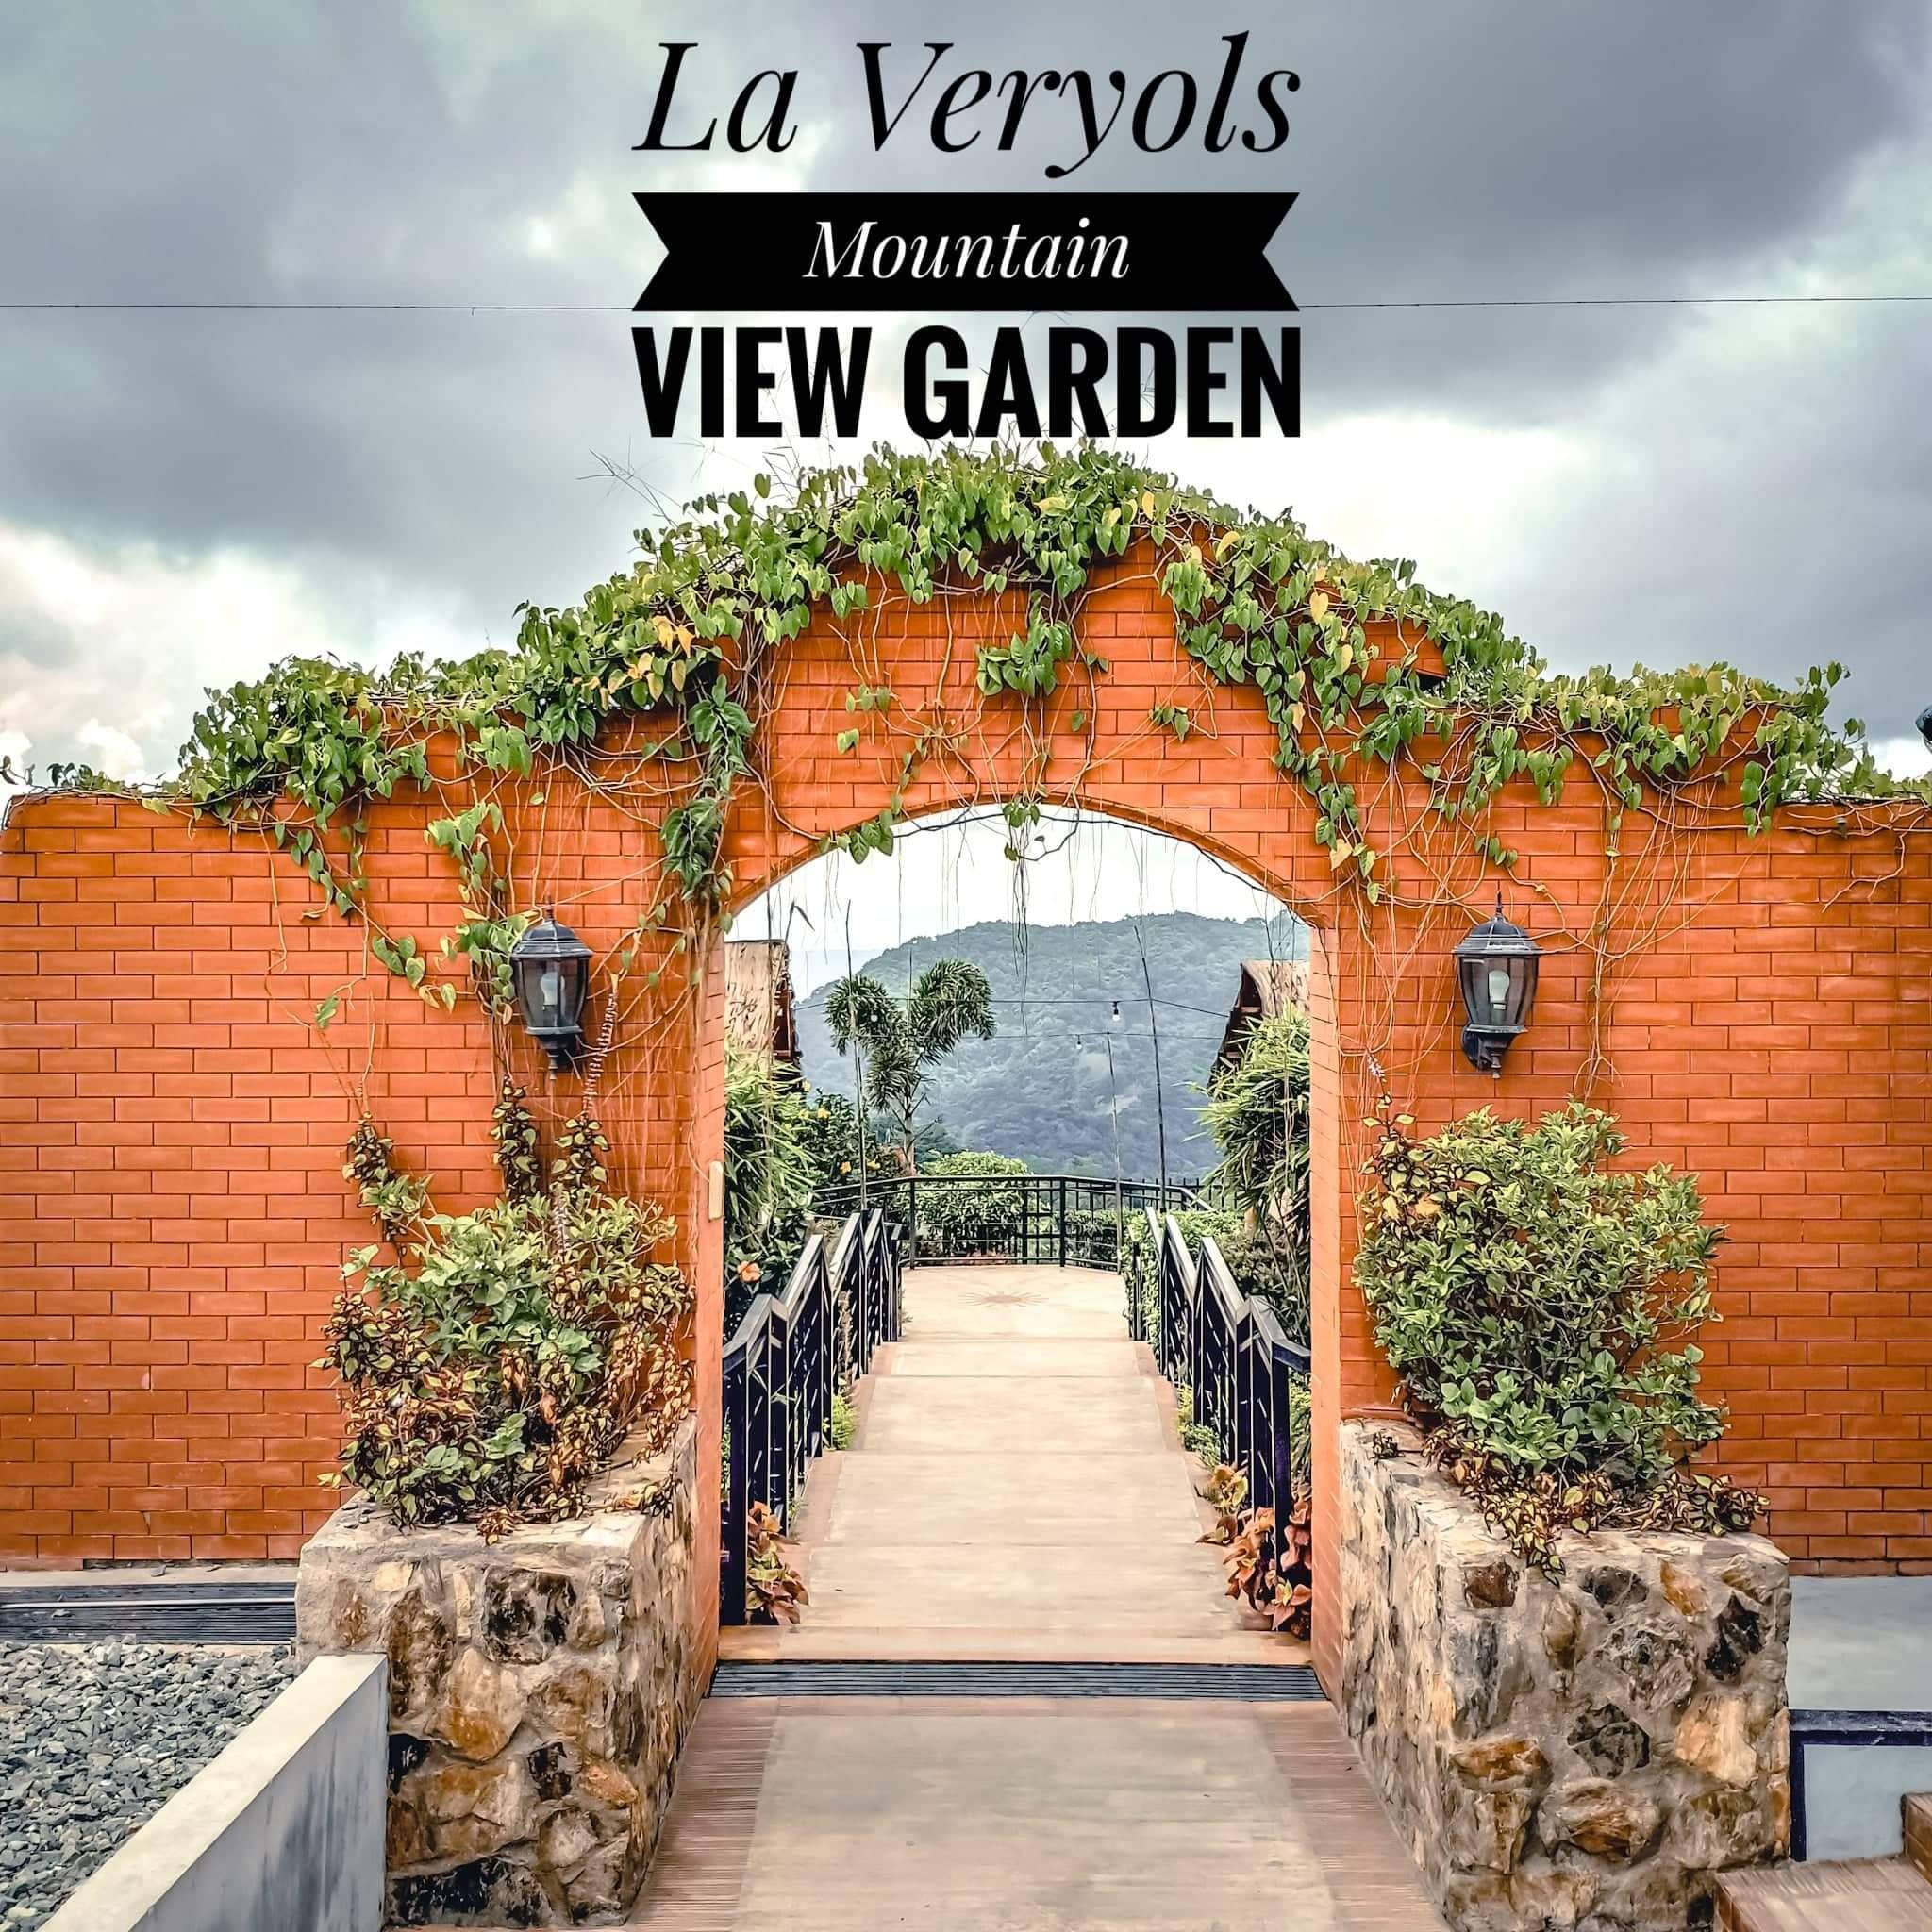 La VeryOl's Mountain View Garden